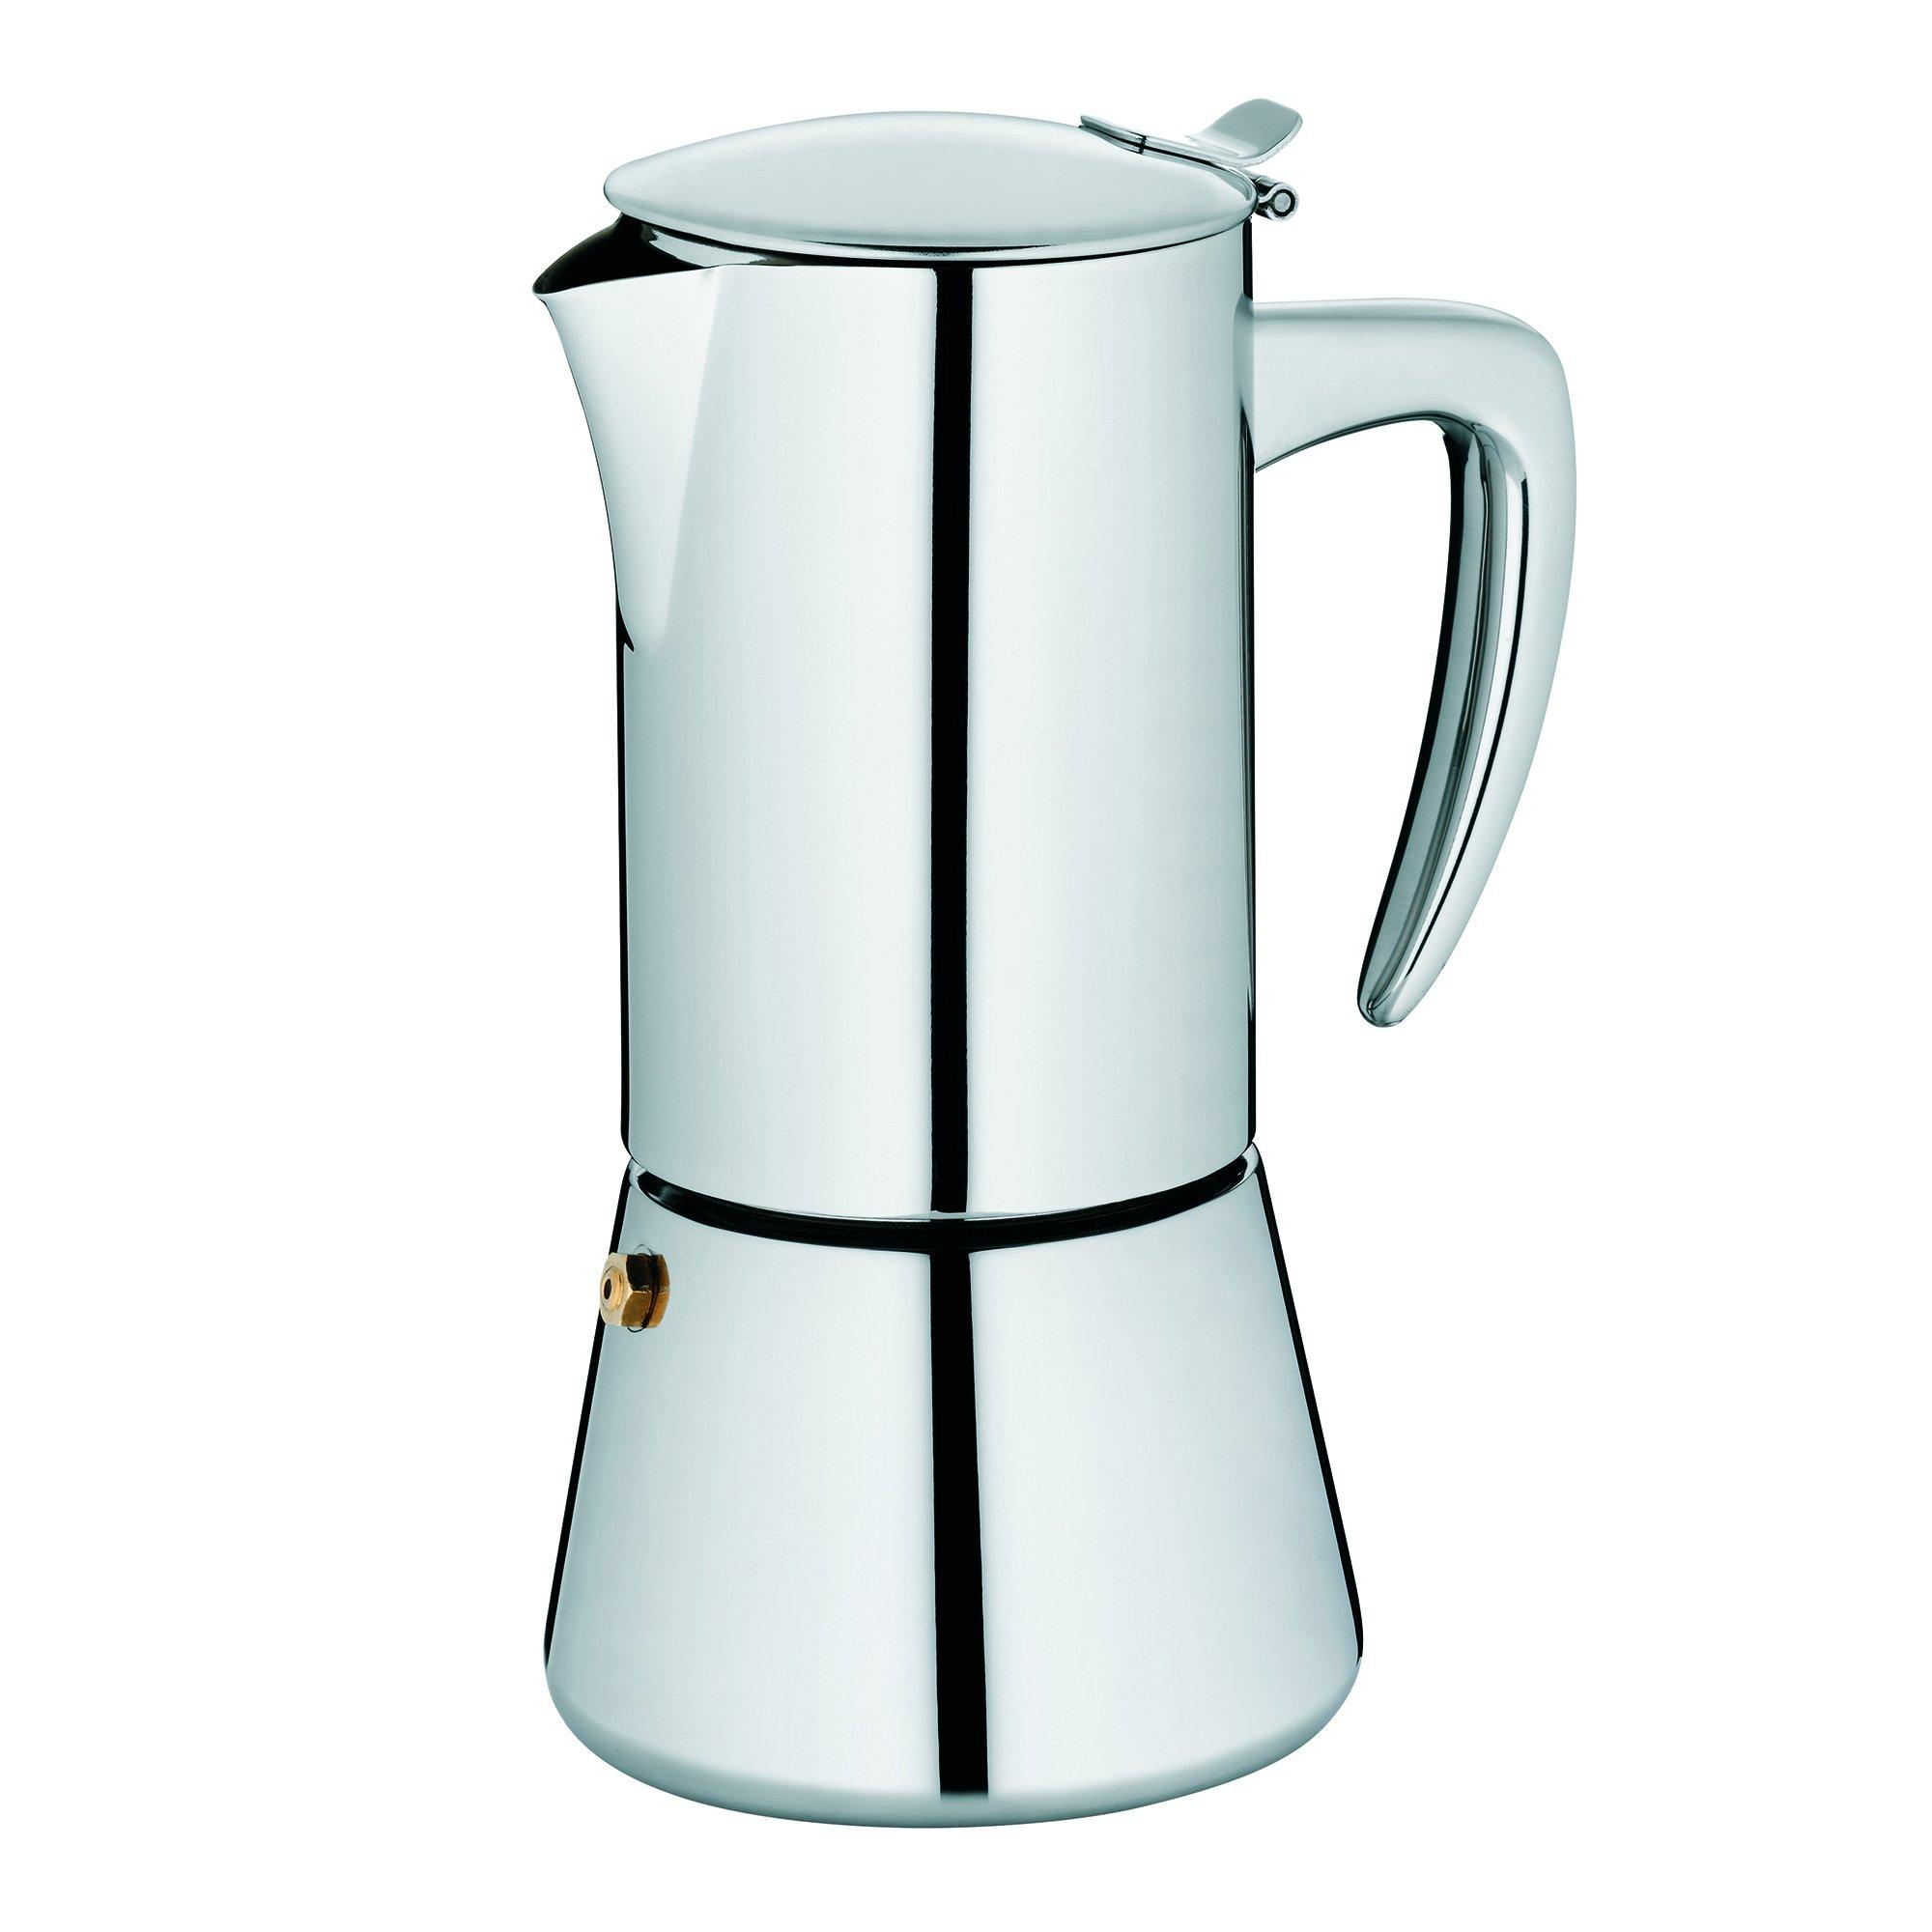 Cafetera acero inoxidable, para inducci/ón, 200 ml, 4 tazas Kela 10835 Latina